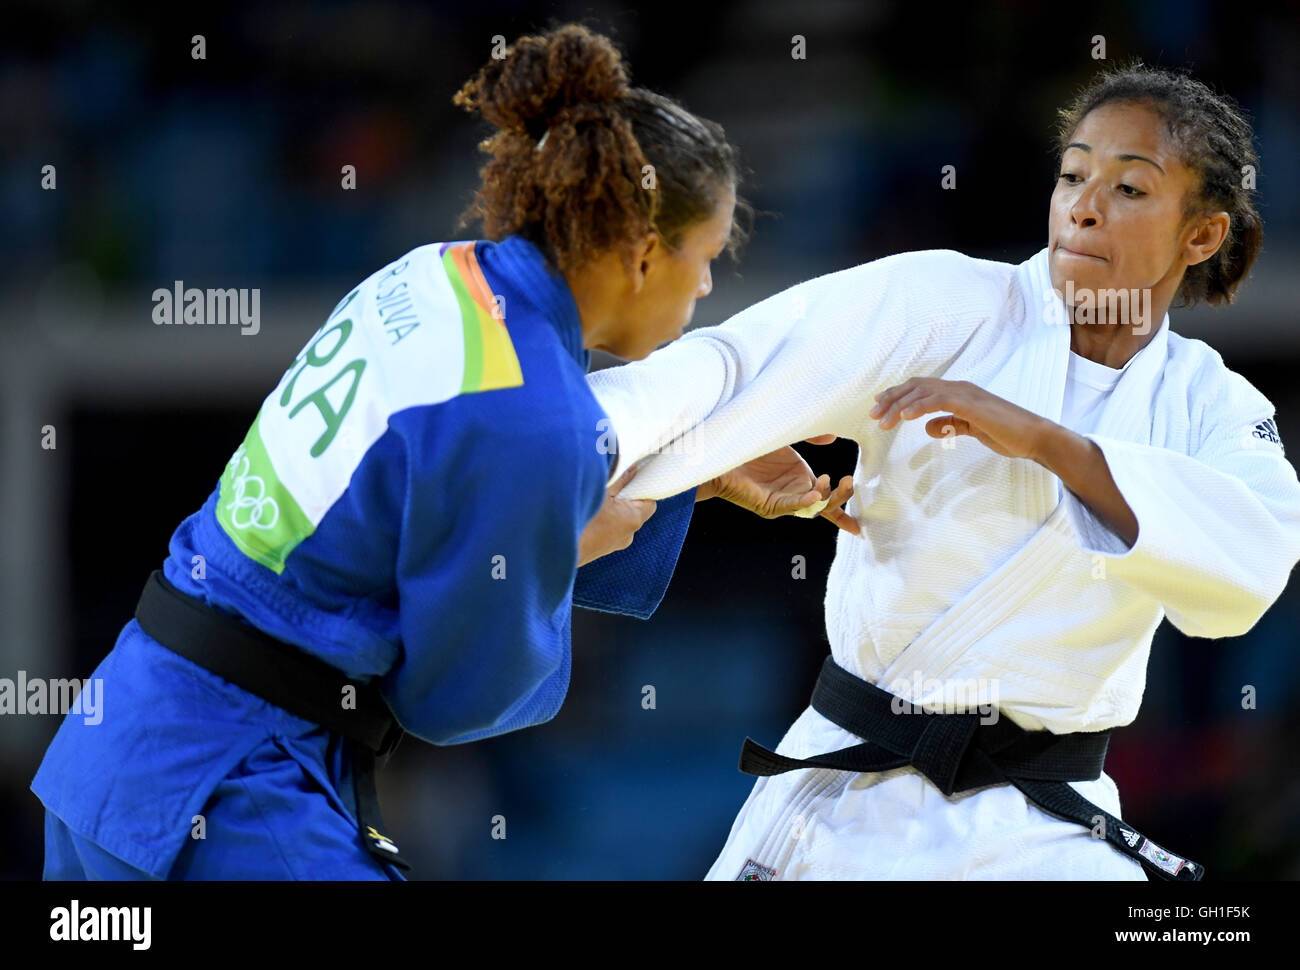 judo olympia live